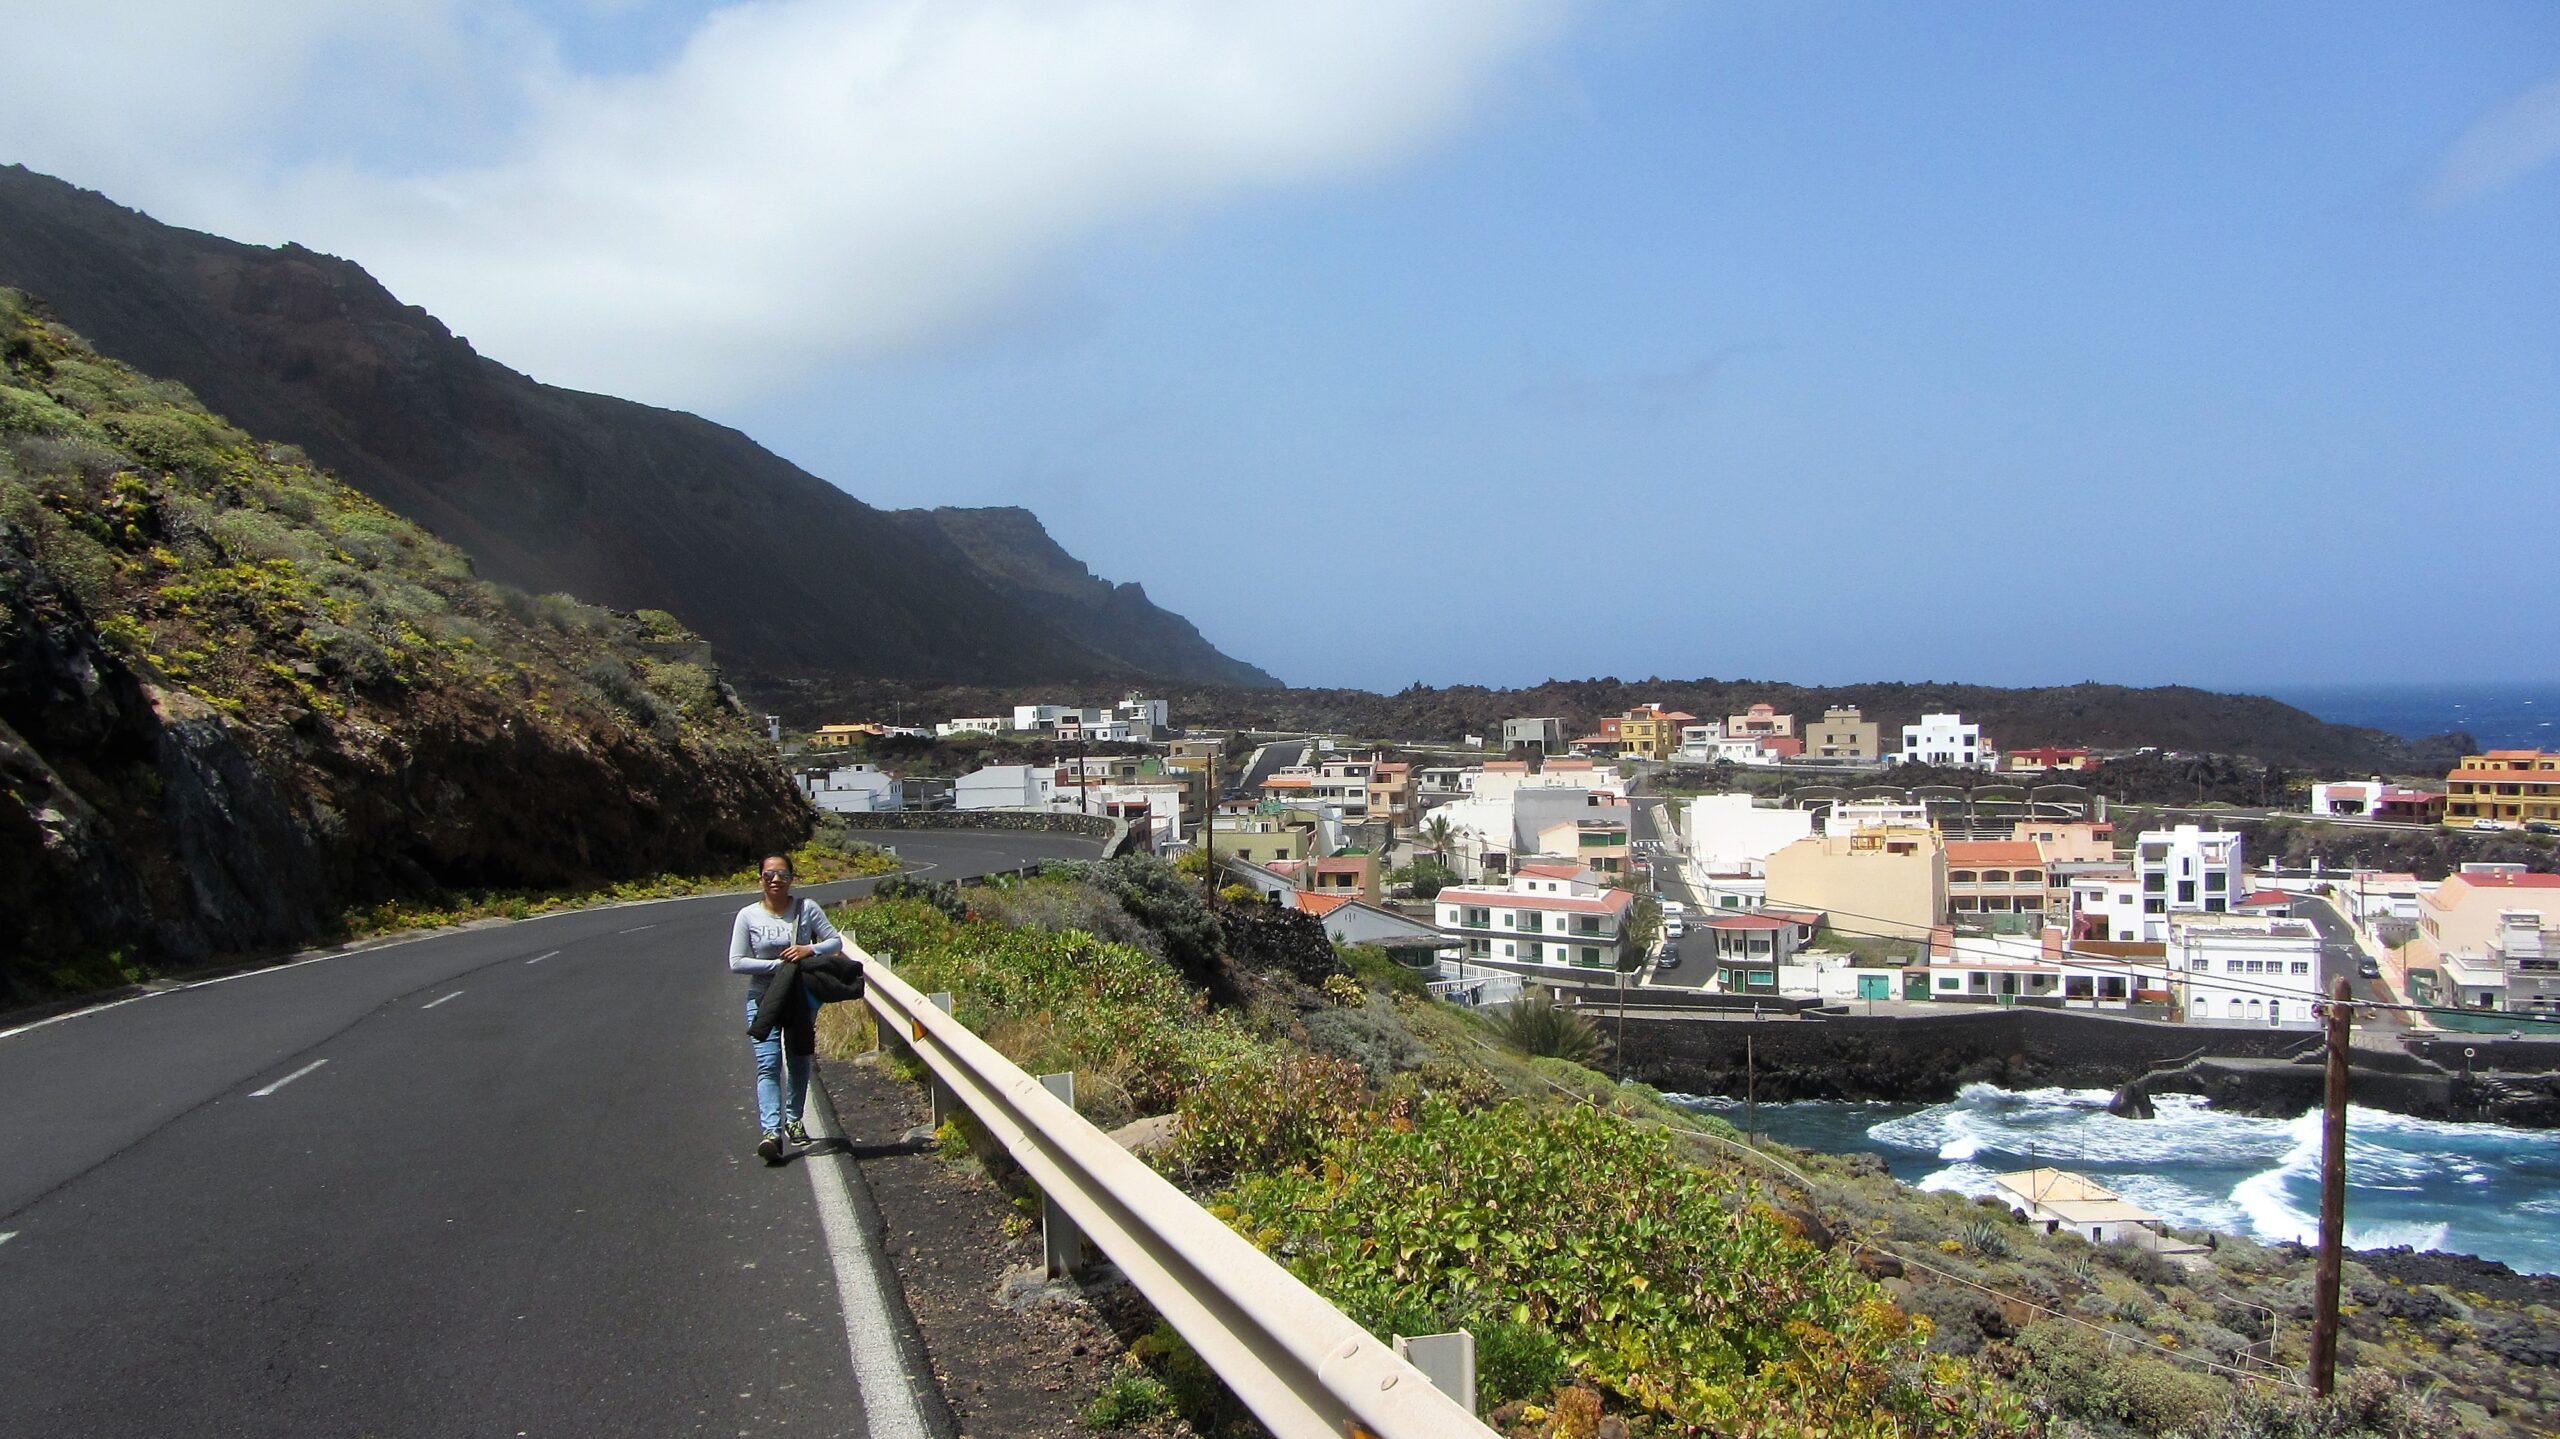 Walking from Tamaduste Village